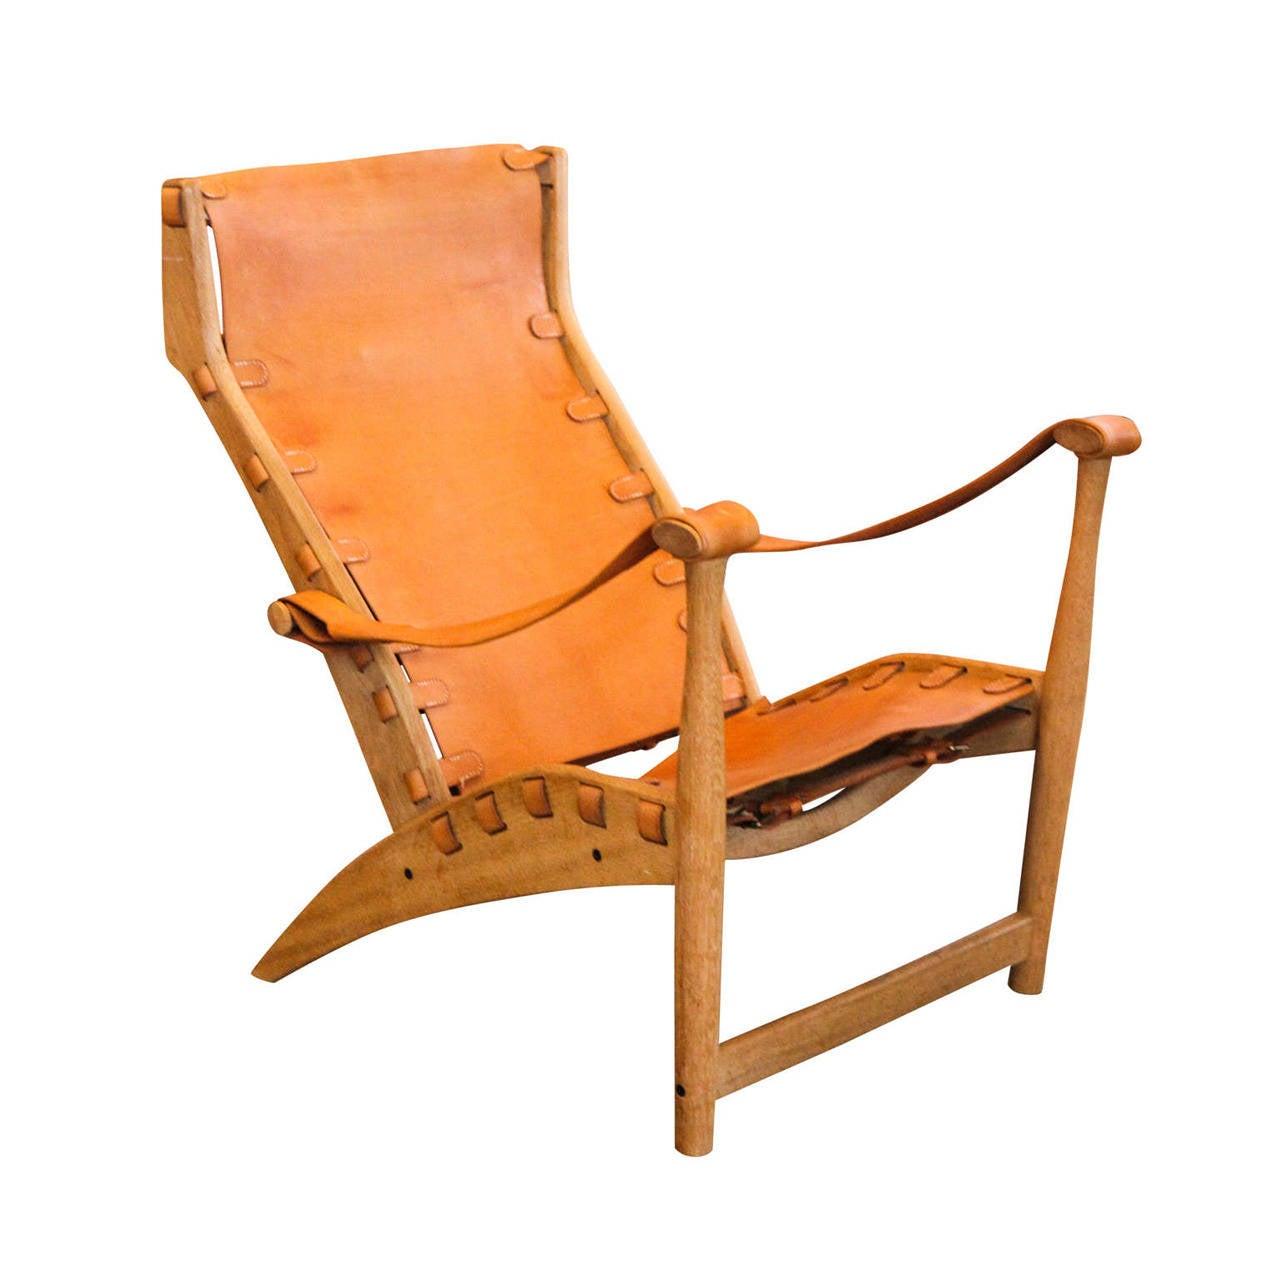 copenhagen dining chairs dallas cowboy chair mogens voltelen denmark at 1stdibs